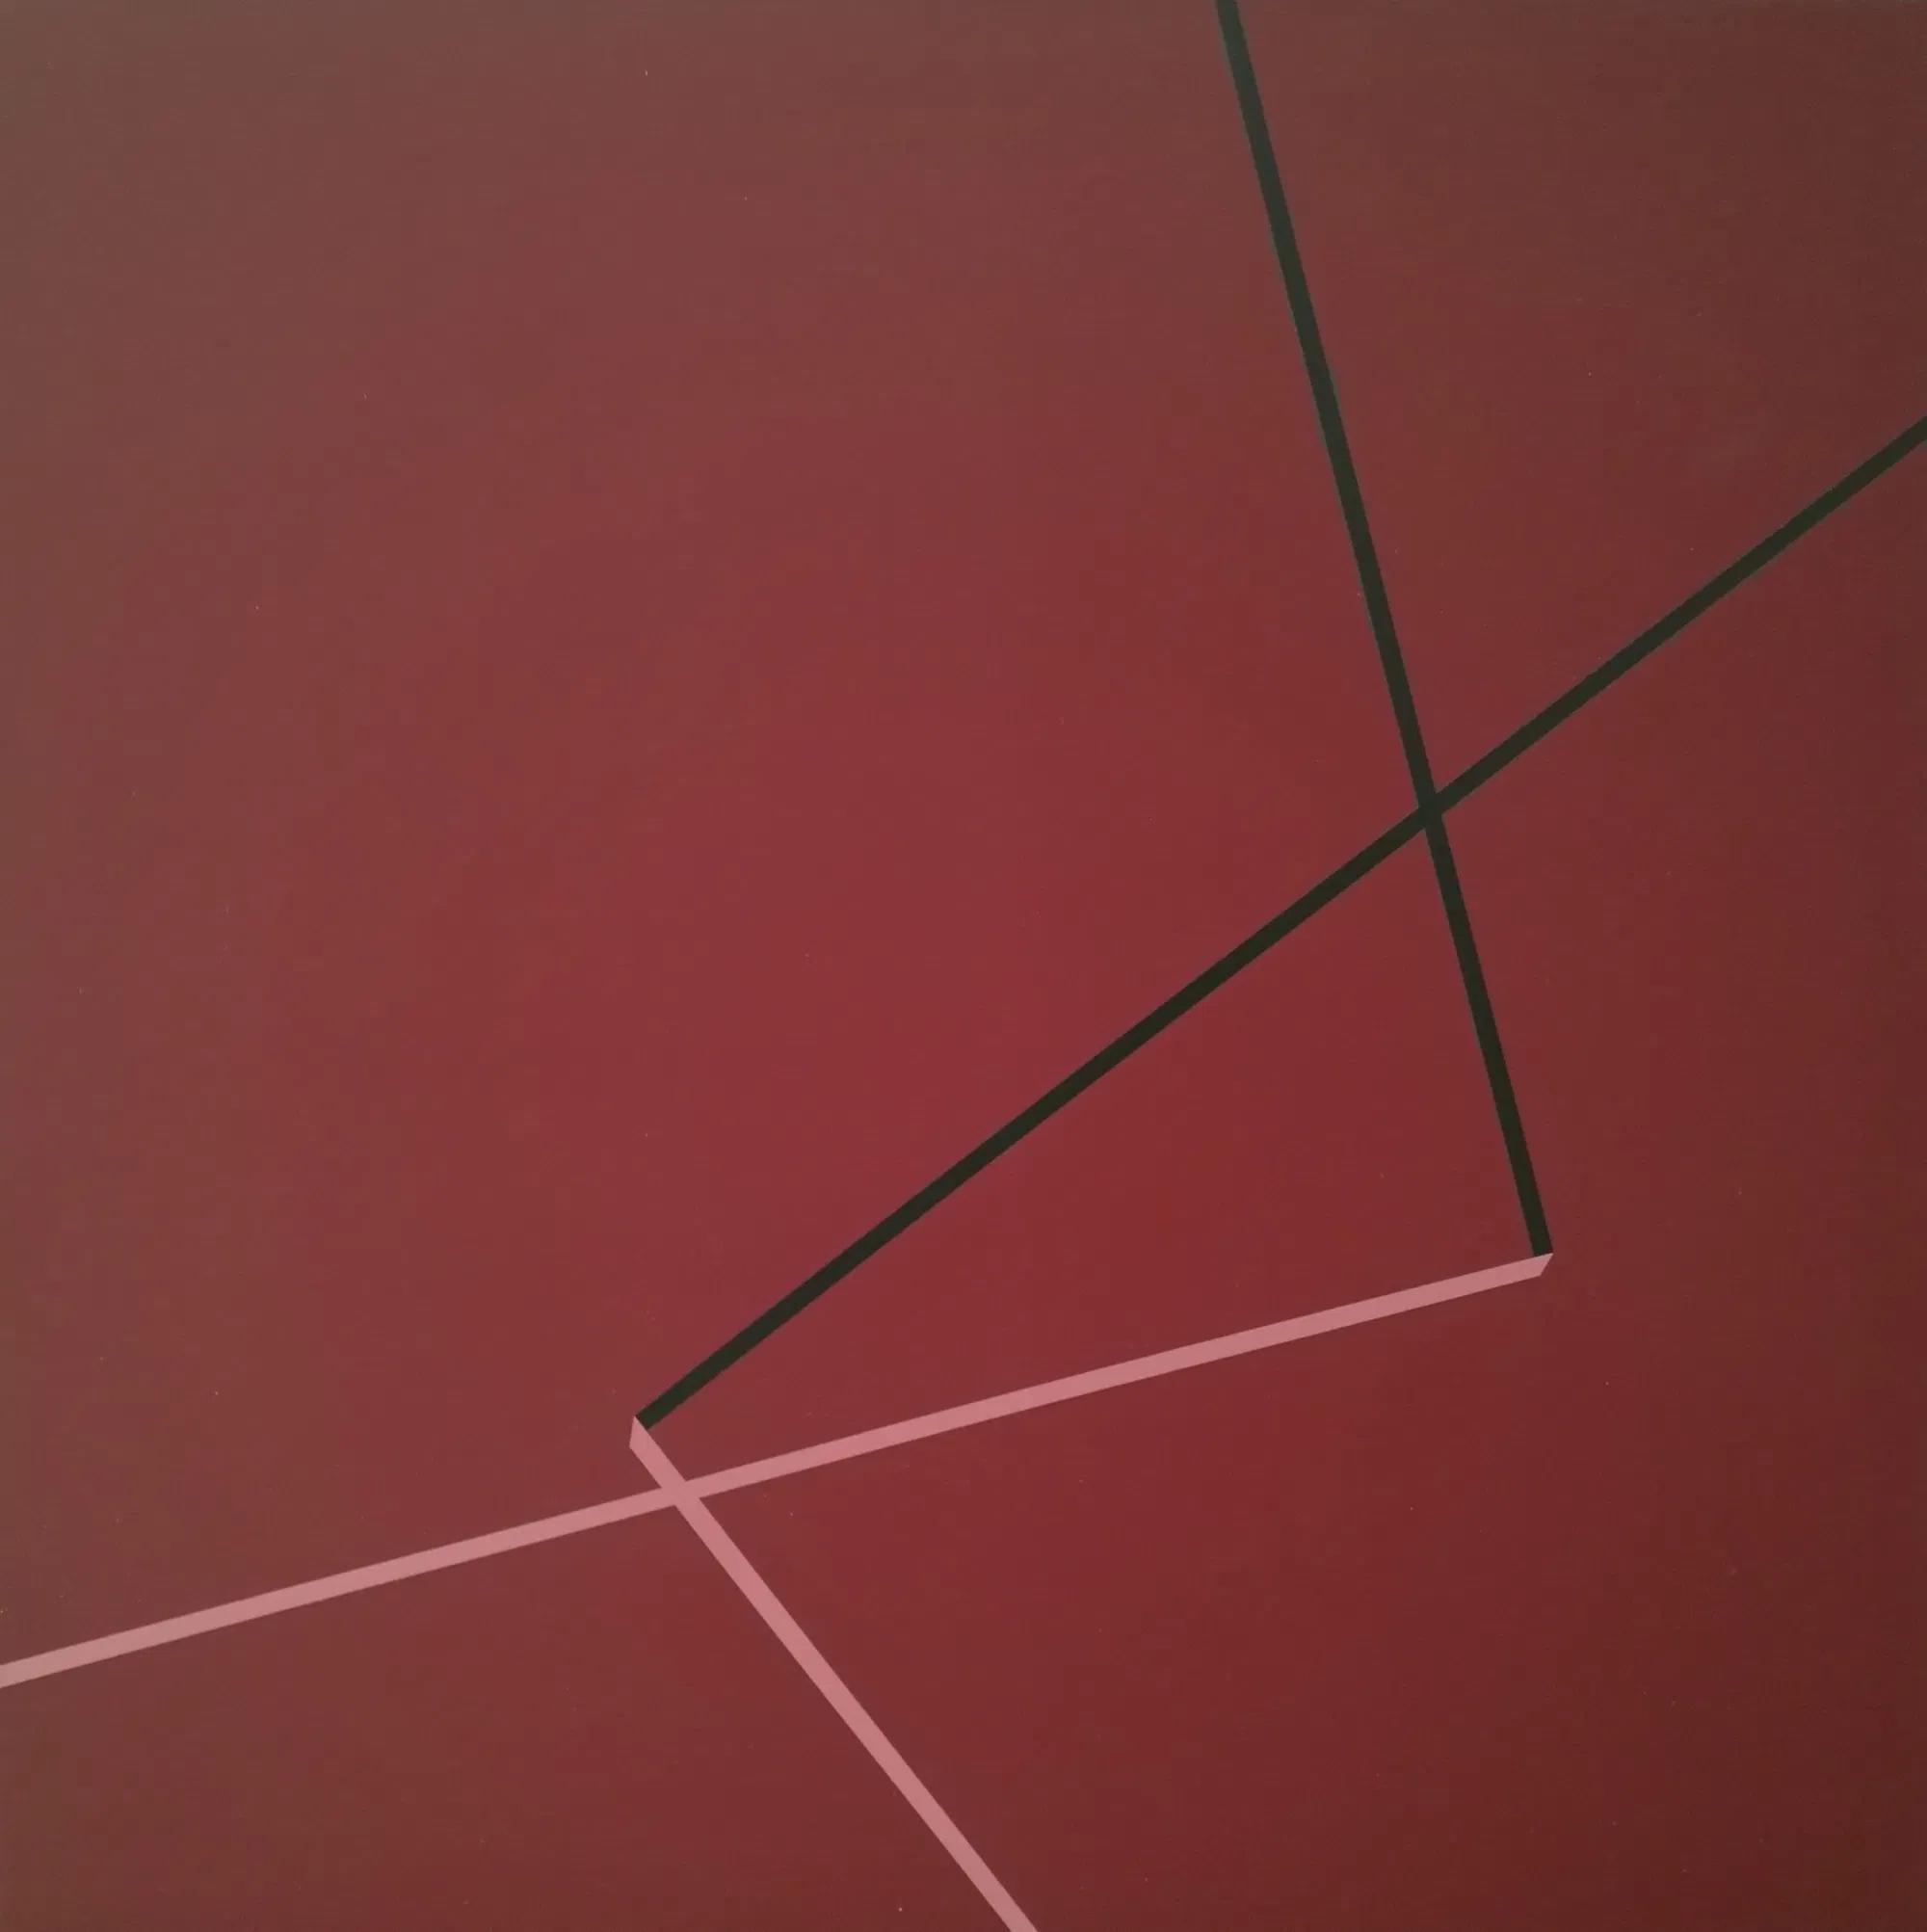 Vera Molnar, Deux Angles Droits, Acryl auf Leinwand, 100 x 100 cm, 2006